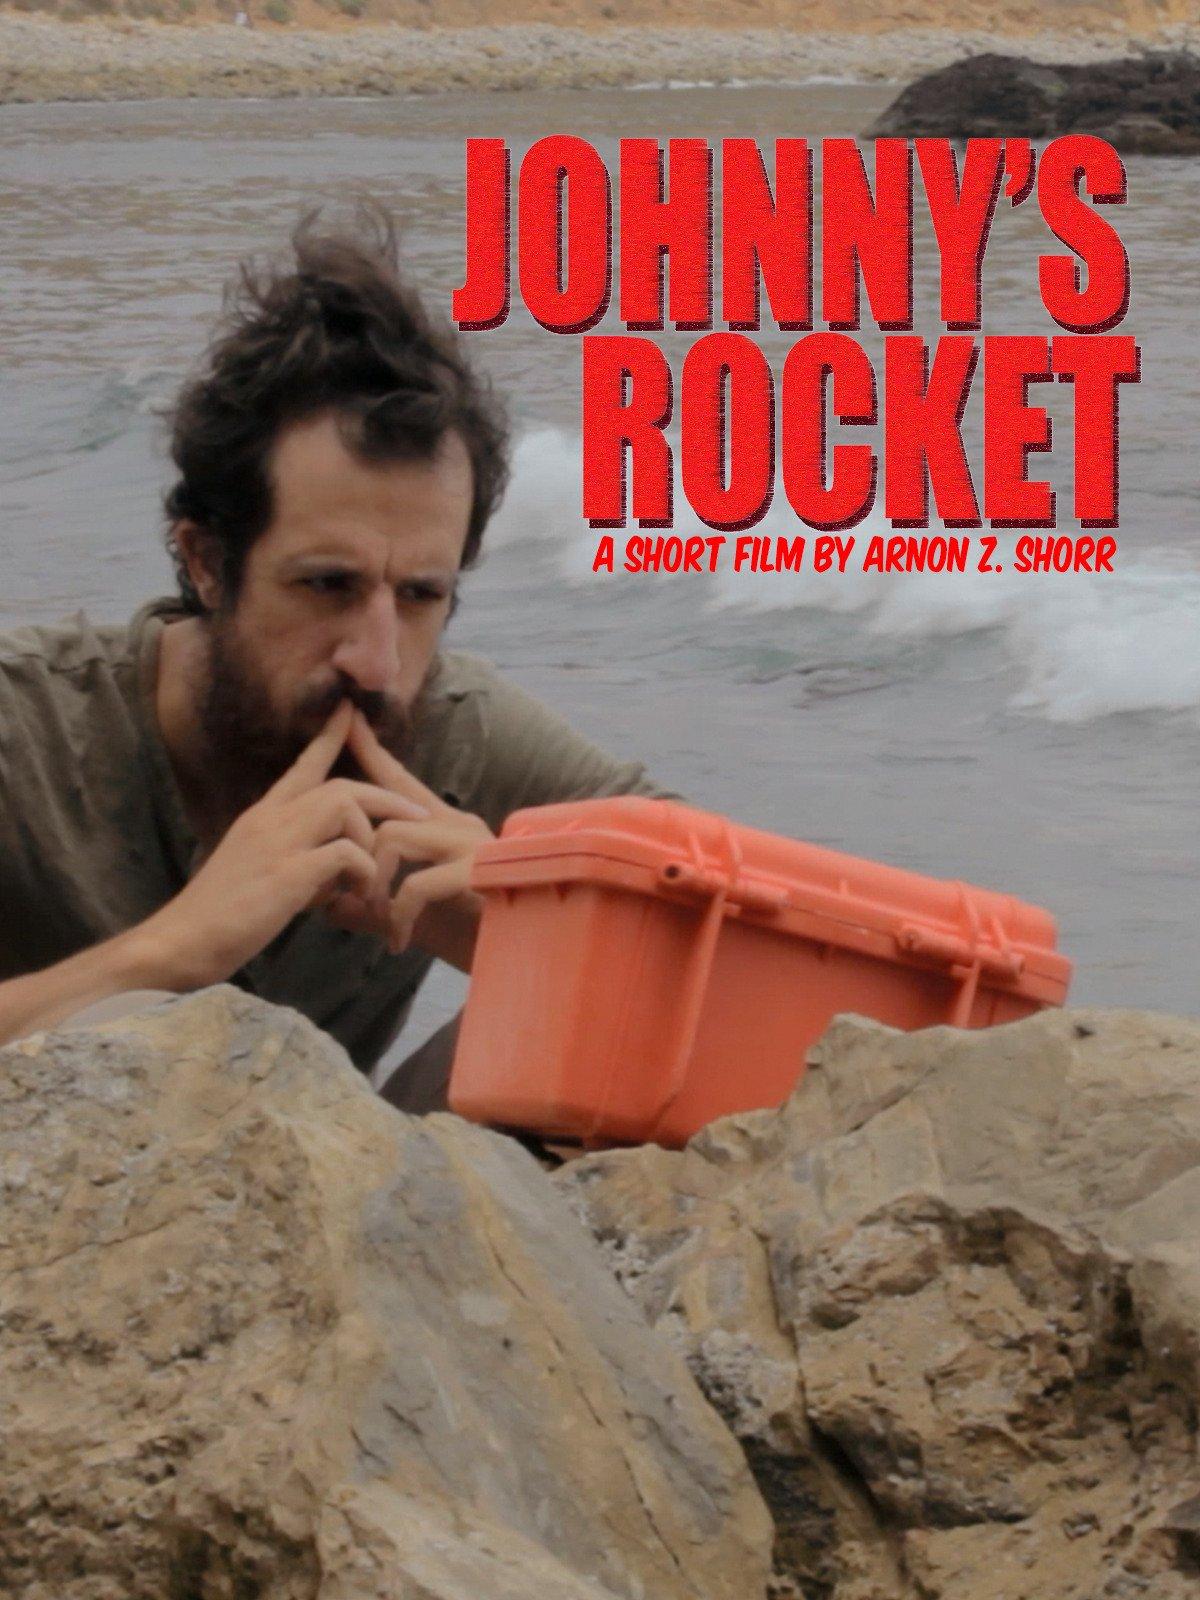 Johnny's Rocket